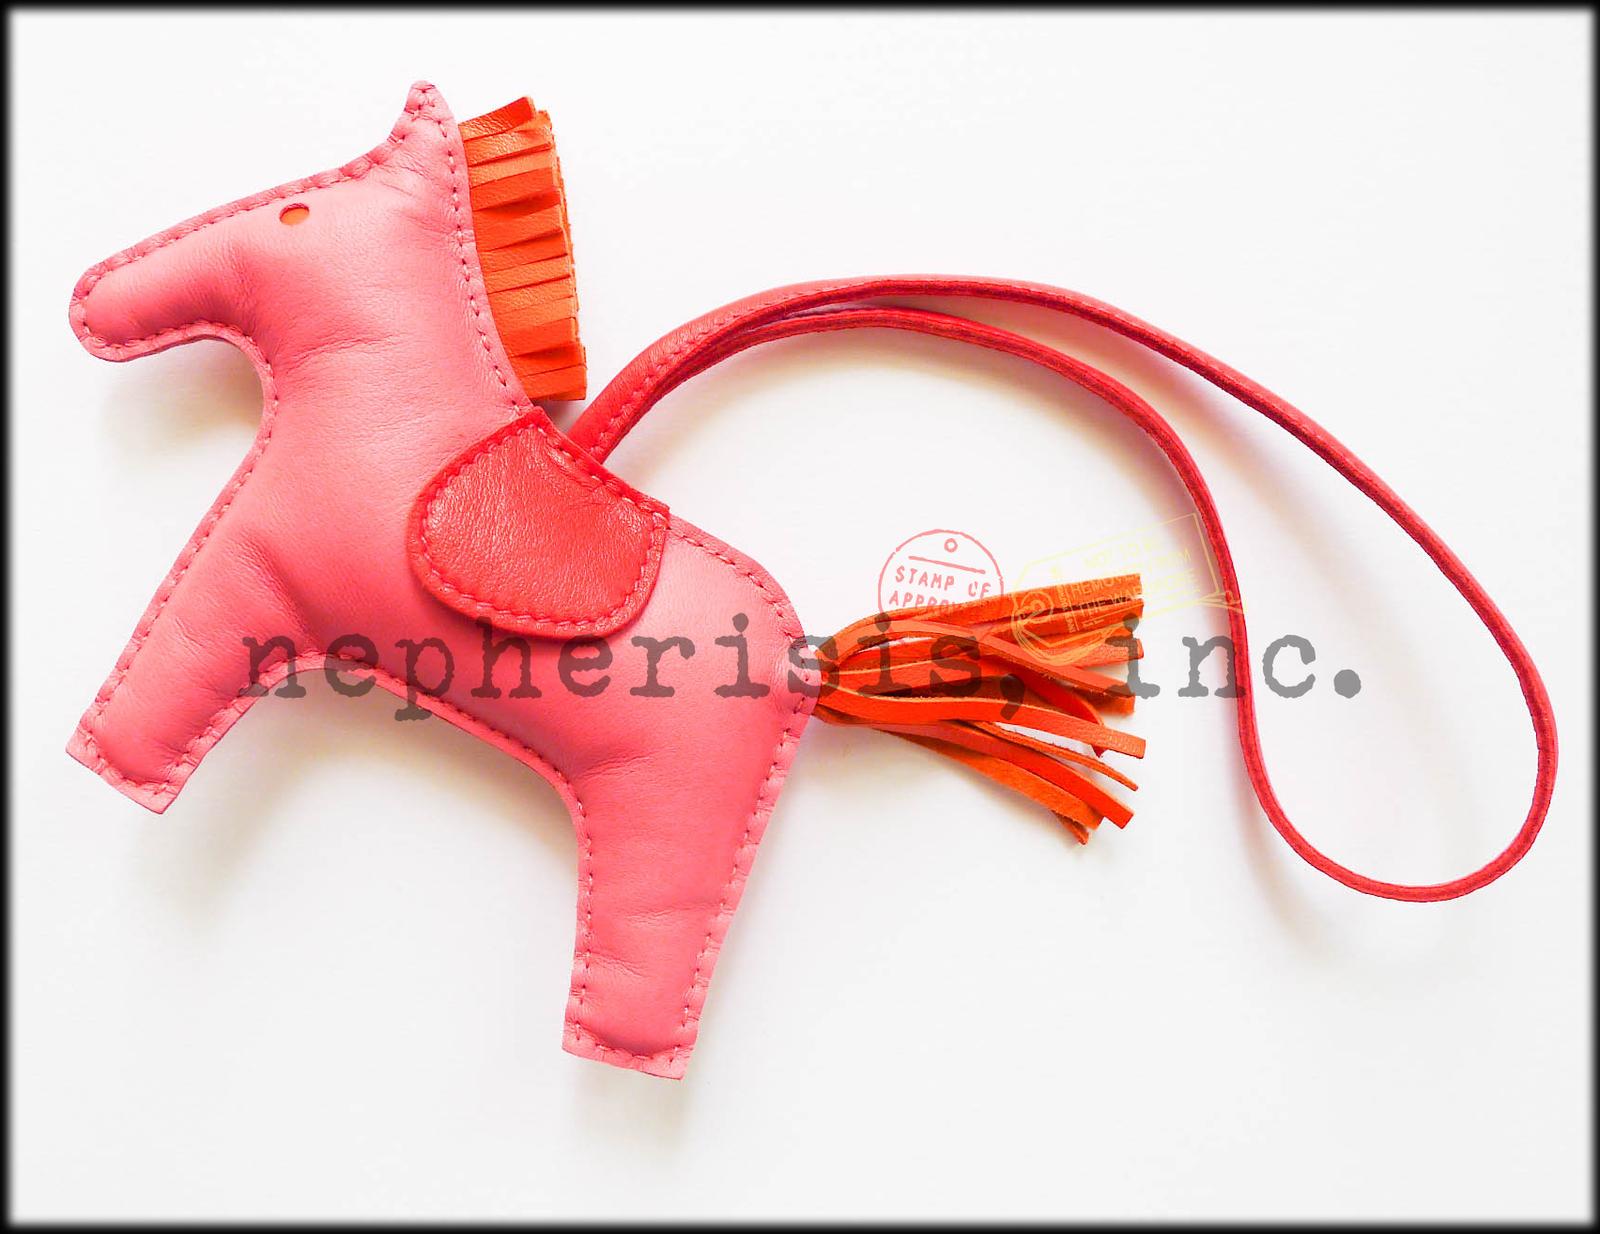 c3454c8708fb Azalea. Azalea. Previous. AUTH NWB Hermes Grigri Rodeo Horse MM Medium  Leather Bag Charm PINK ROSE AZALEA